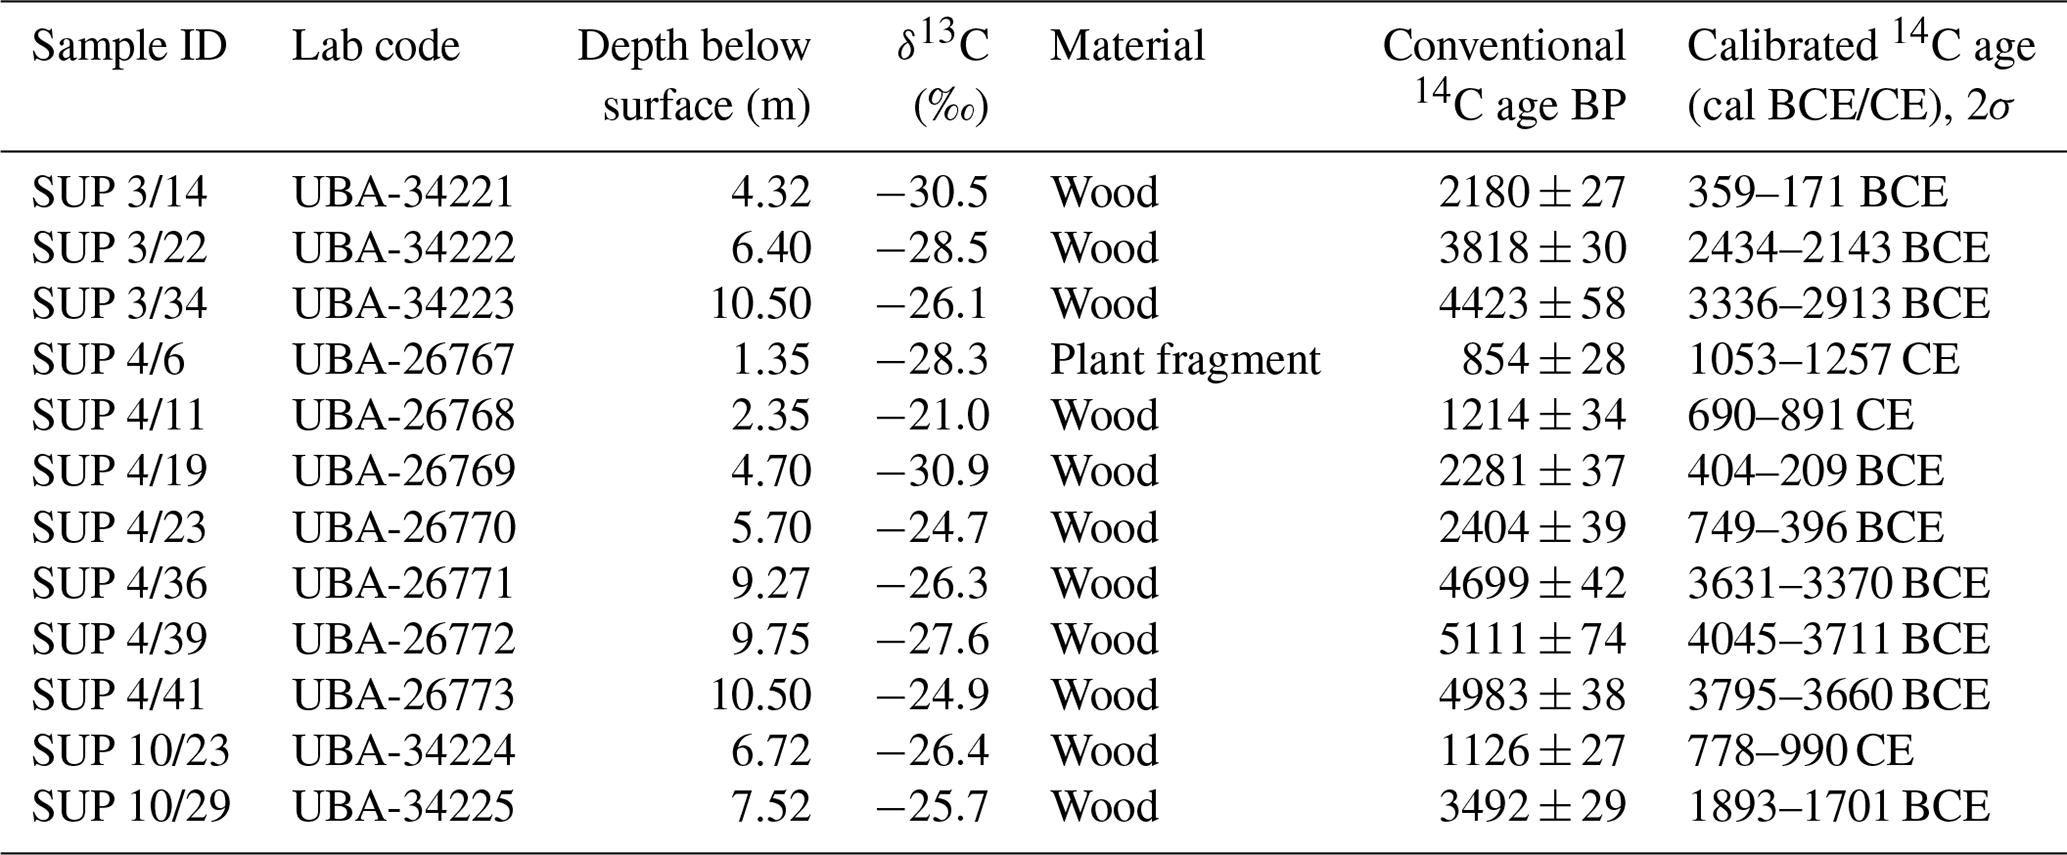 EGQSJ - Coastal lowland and floodplain evolution along the